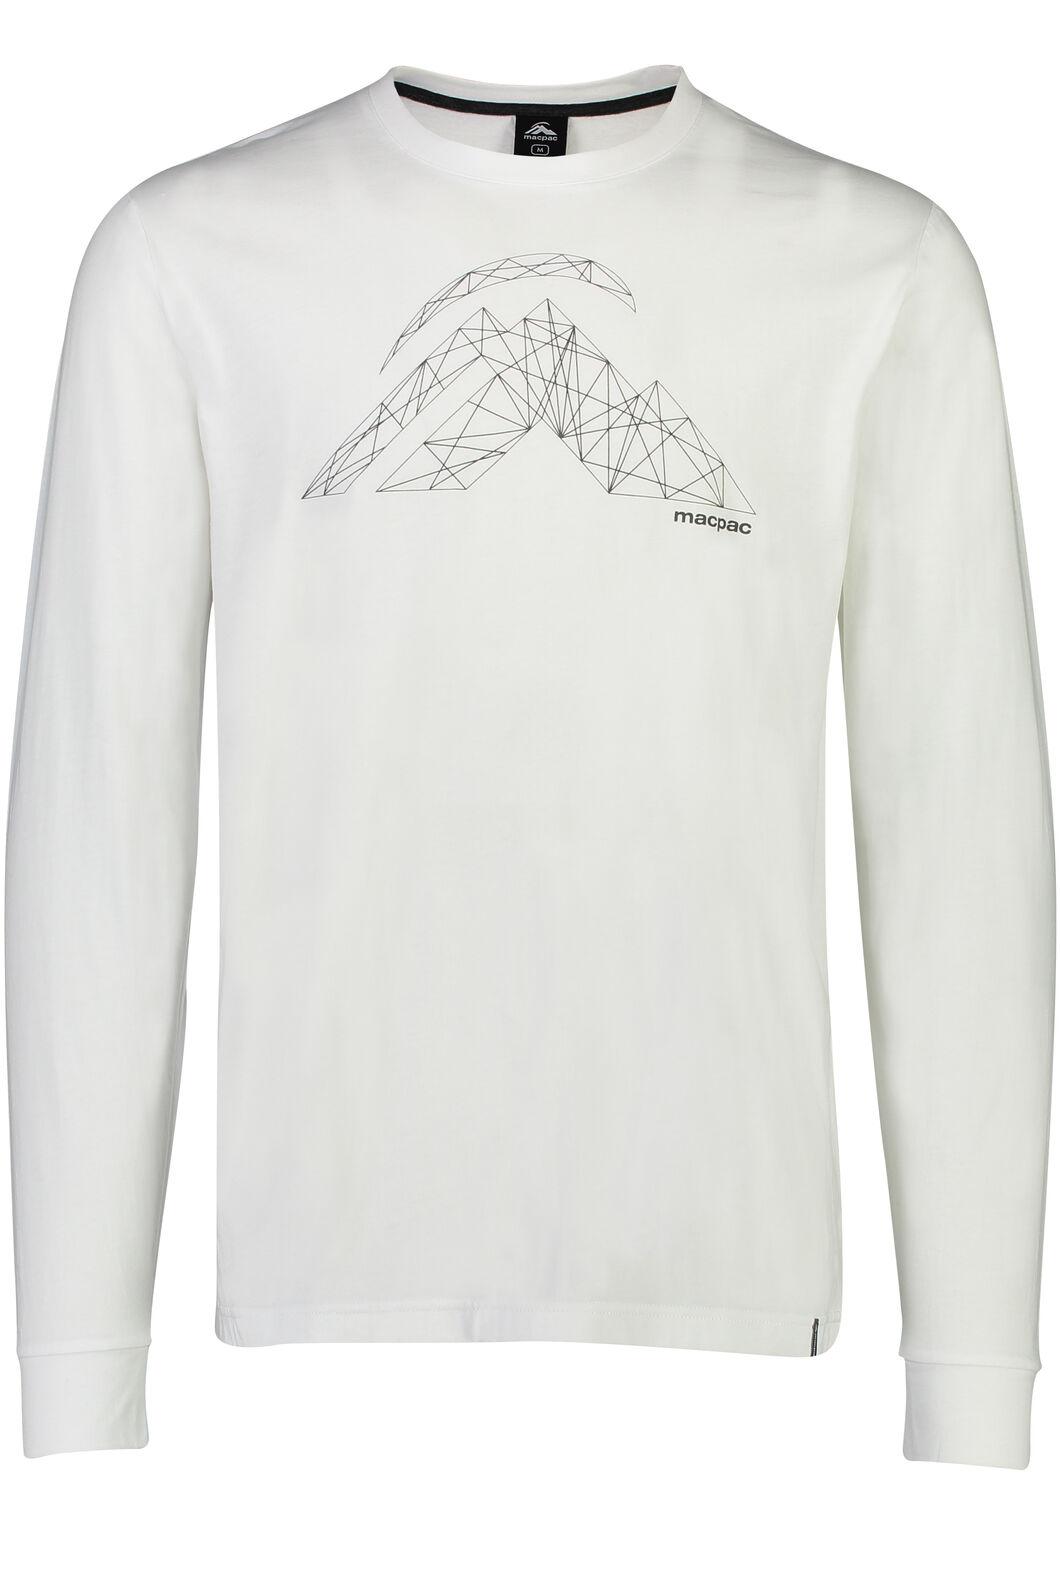 String Logo Long Sleeve Tee - Men's, White, hi-res